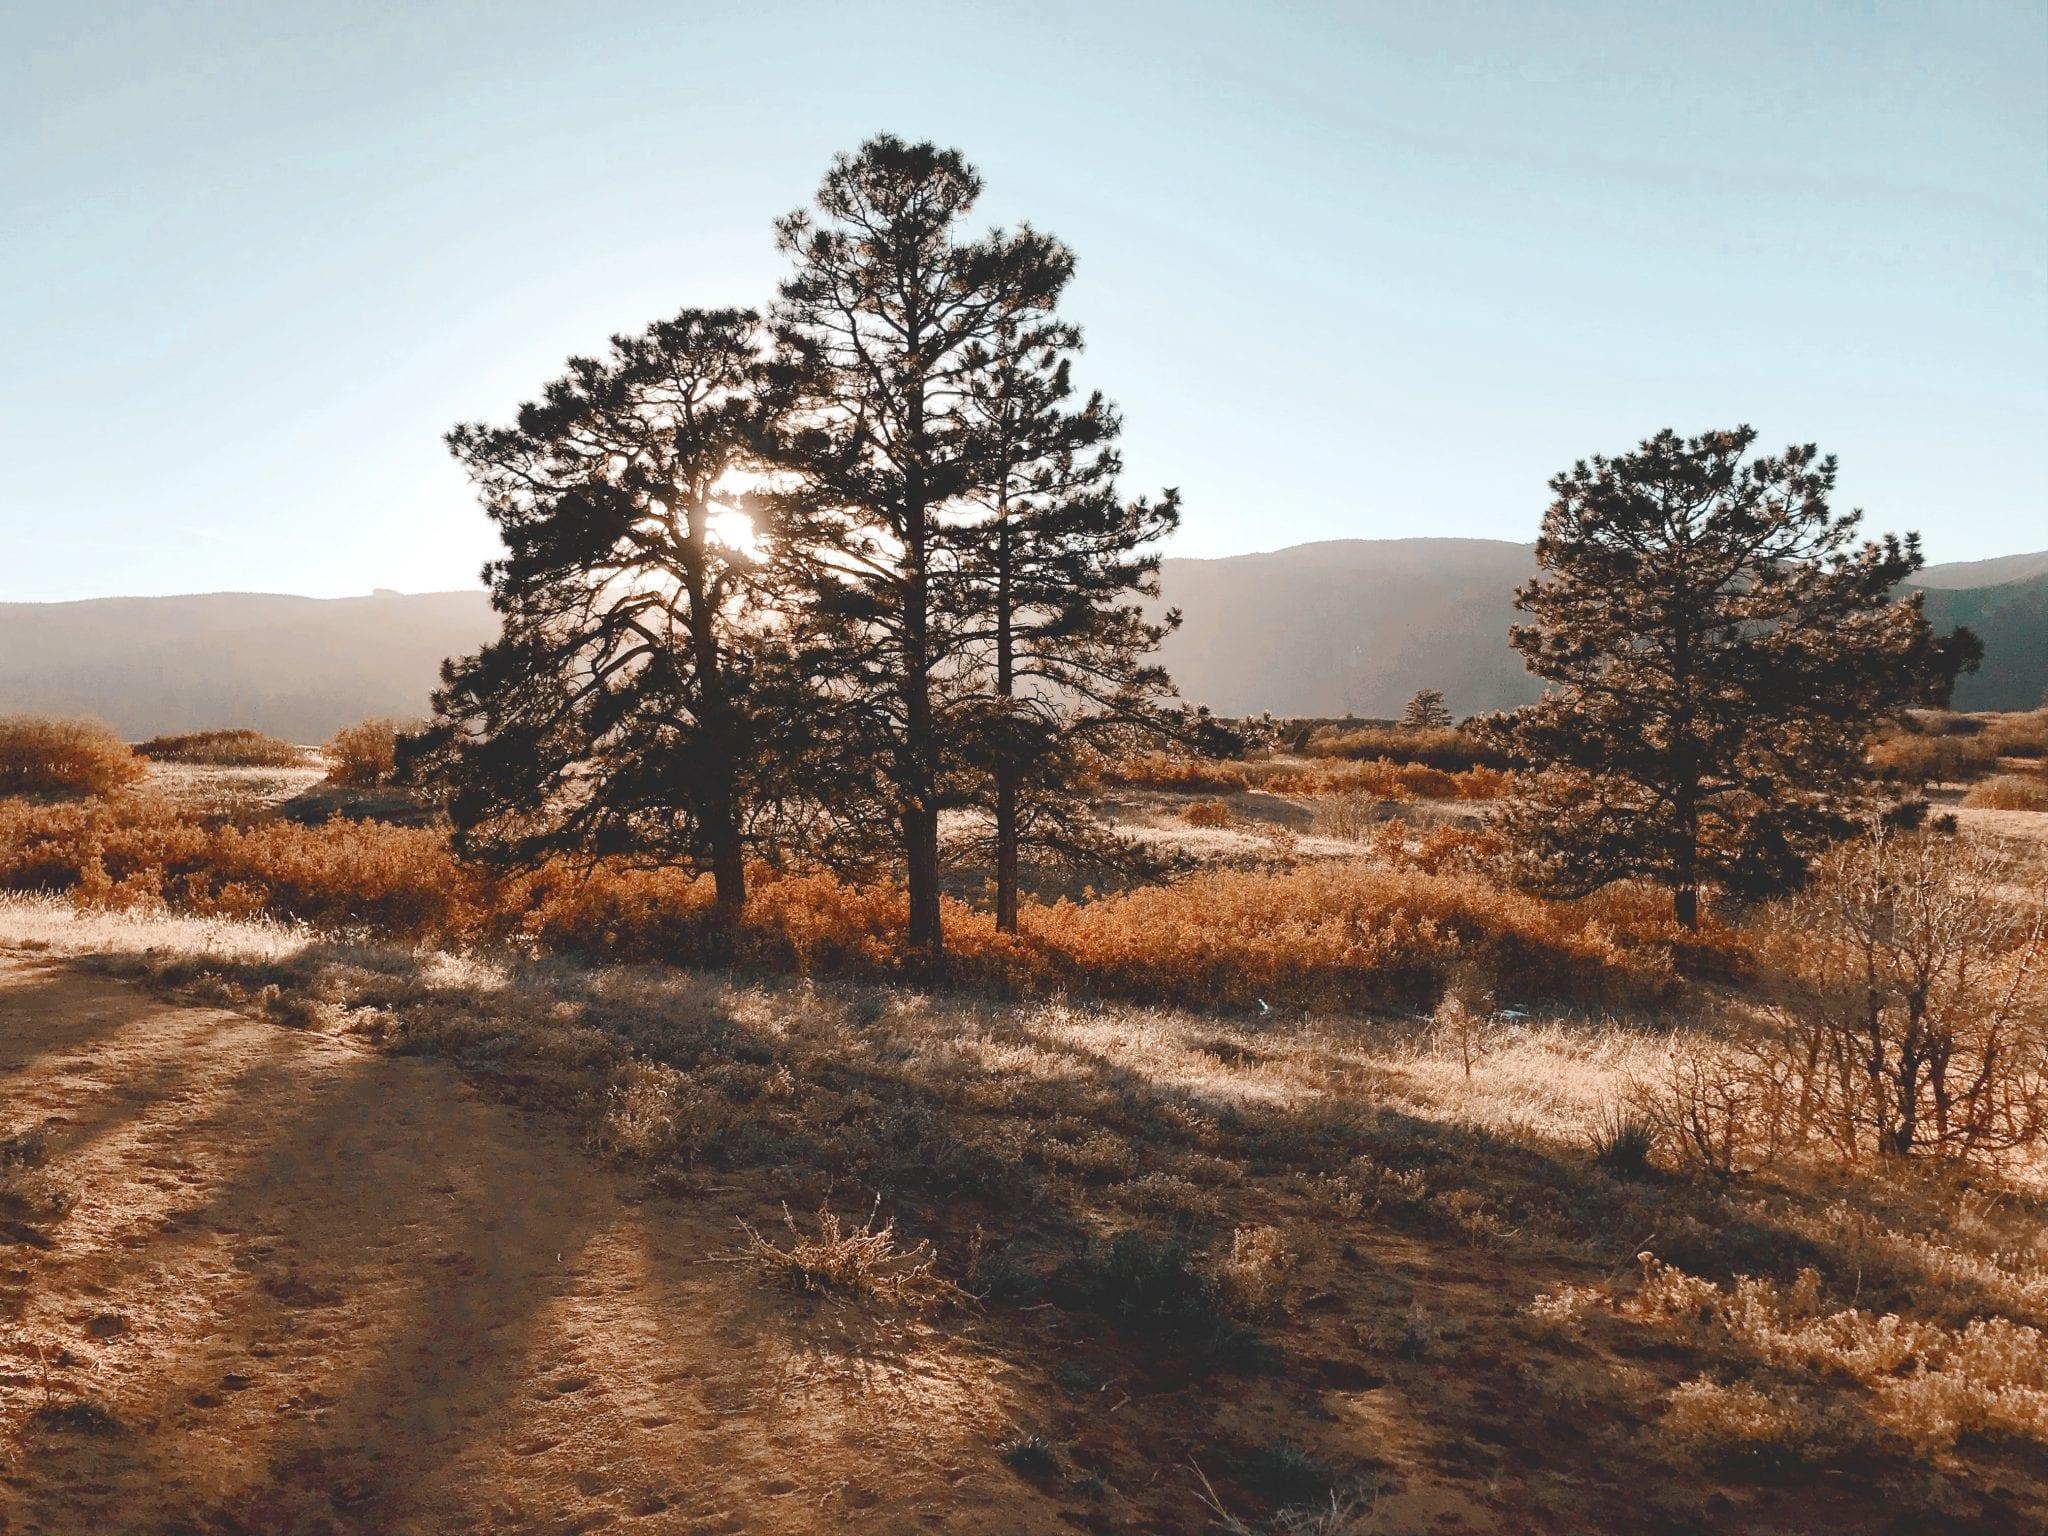 image of sandstone ranch